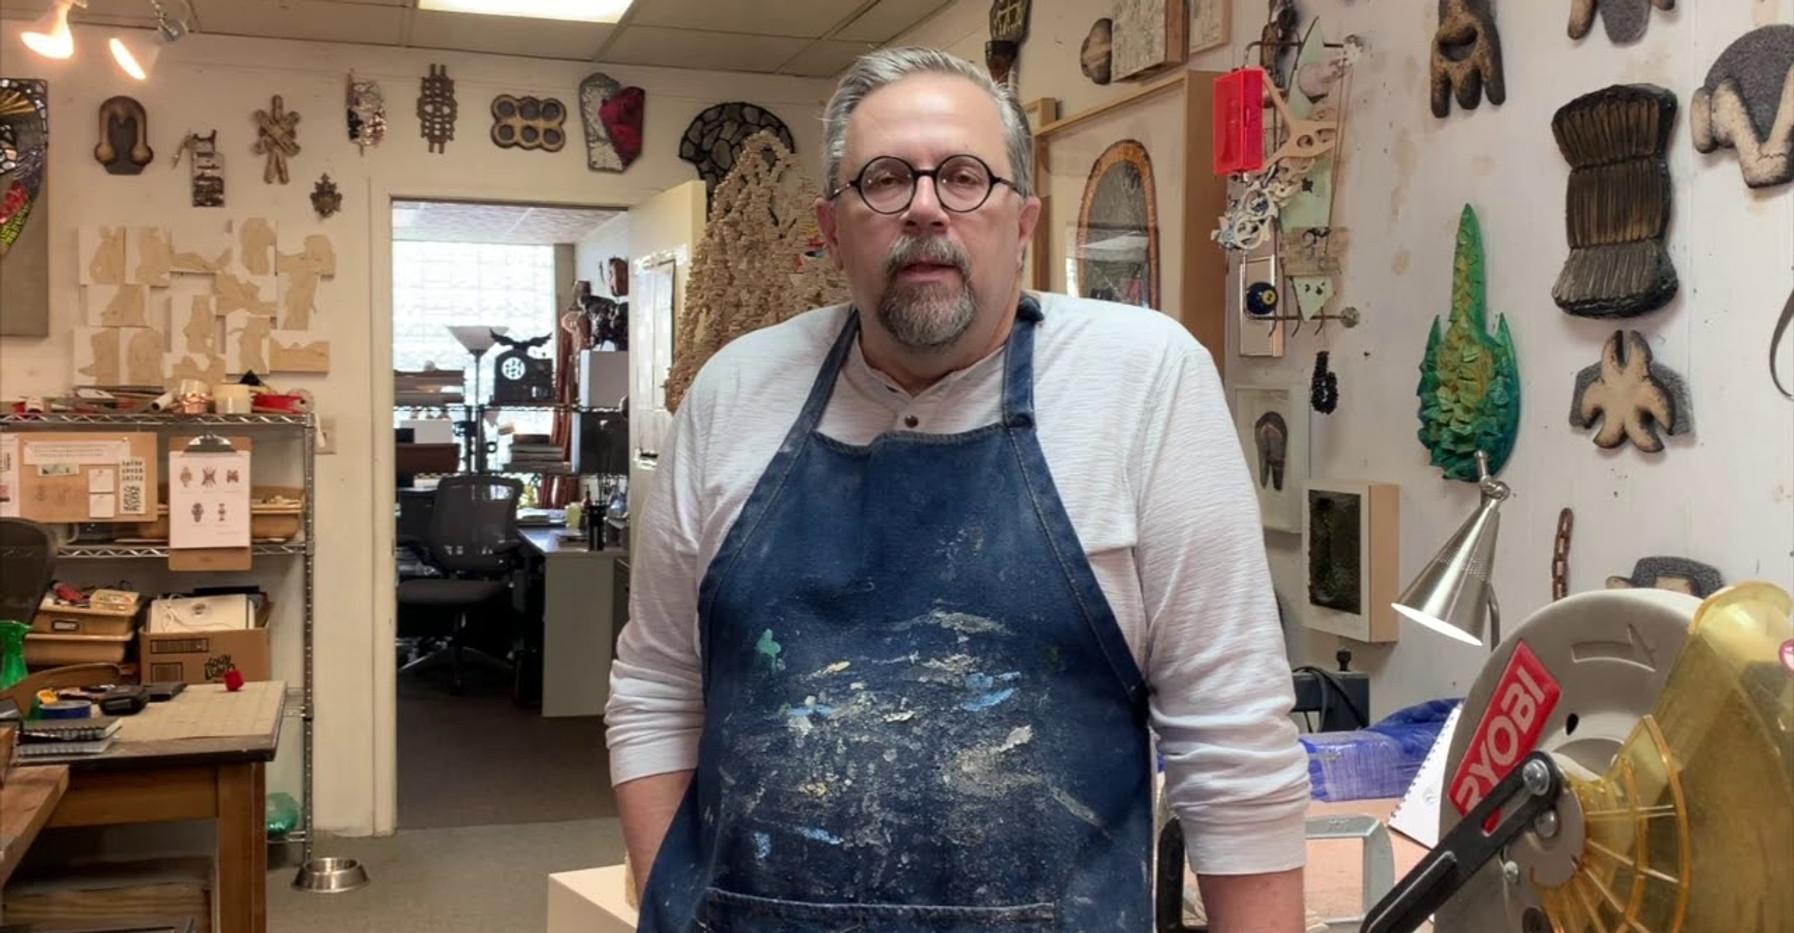 Artist Interview with Robert Mirek